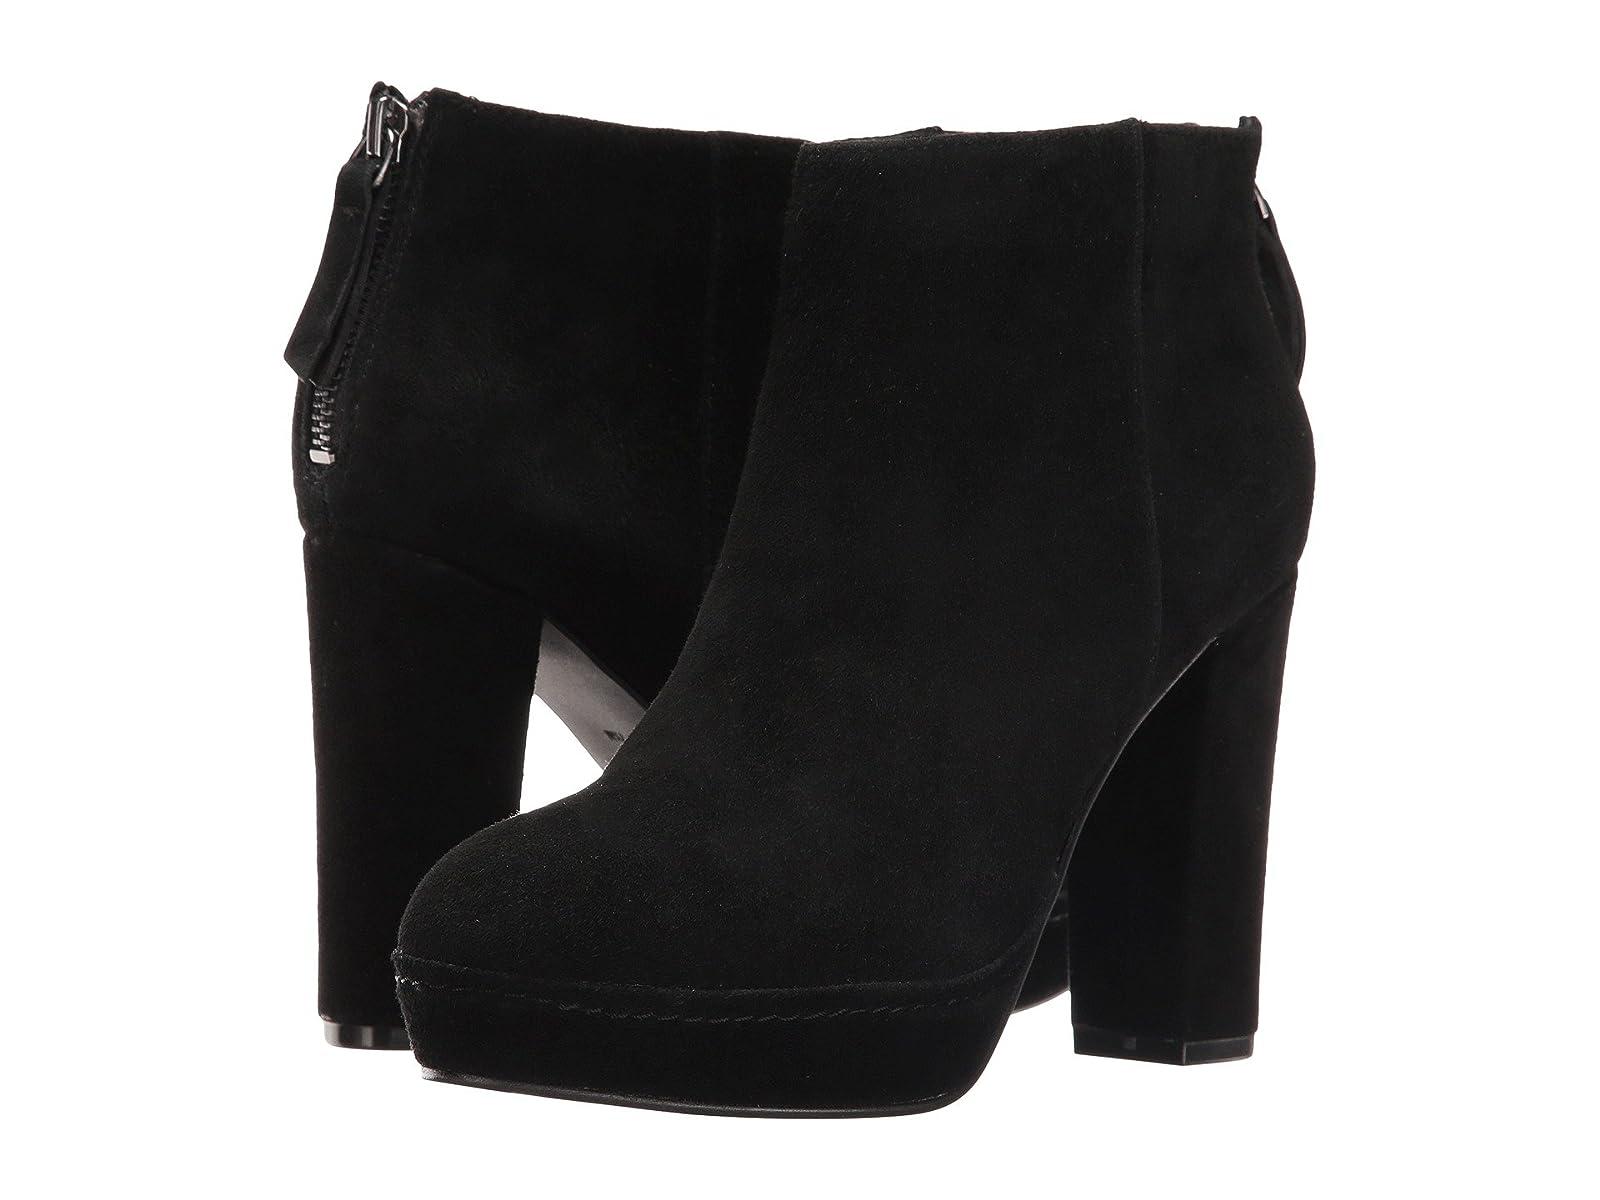 Bettye Muller MeadeCheap and distinctive eye-catching shoes